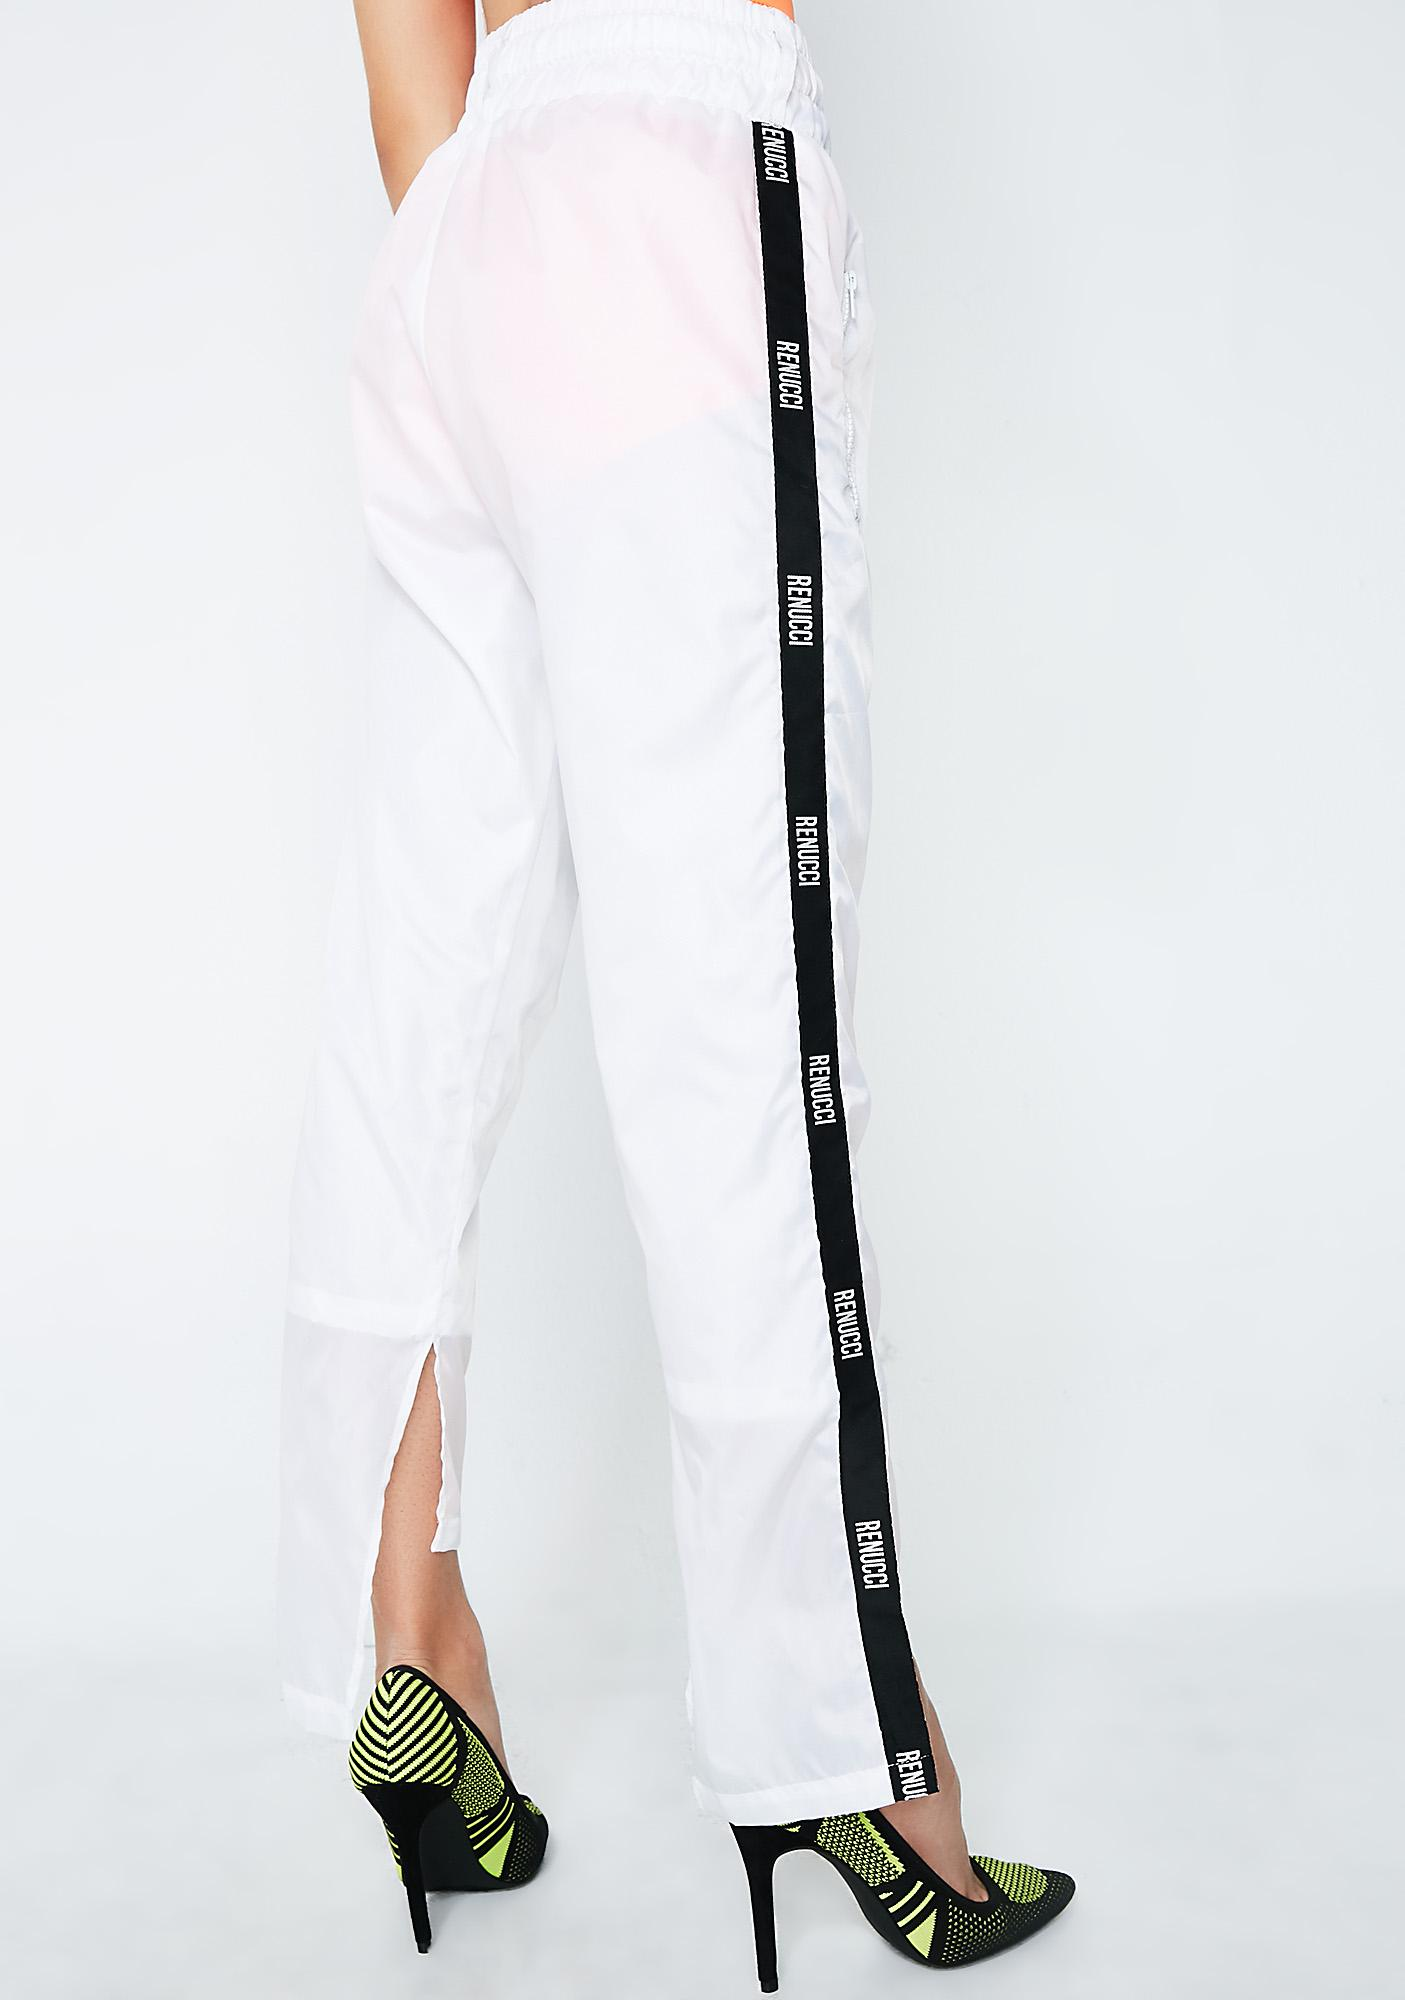 Demian Renucci Relaxed Fit Parachute Pants